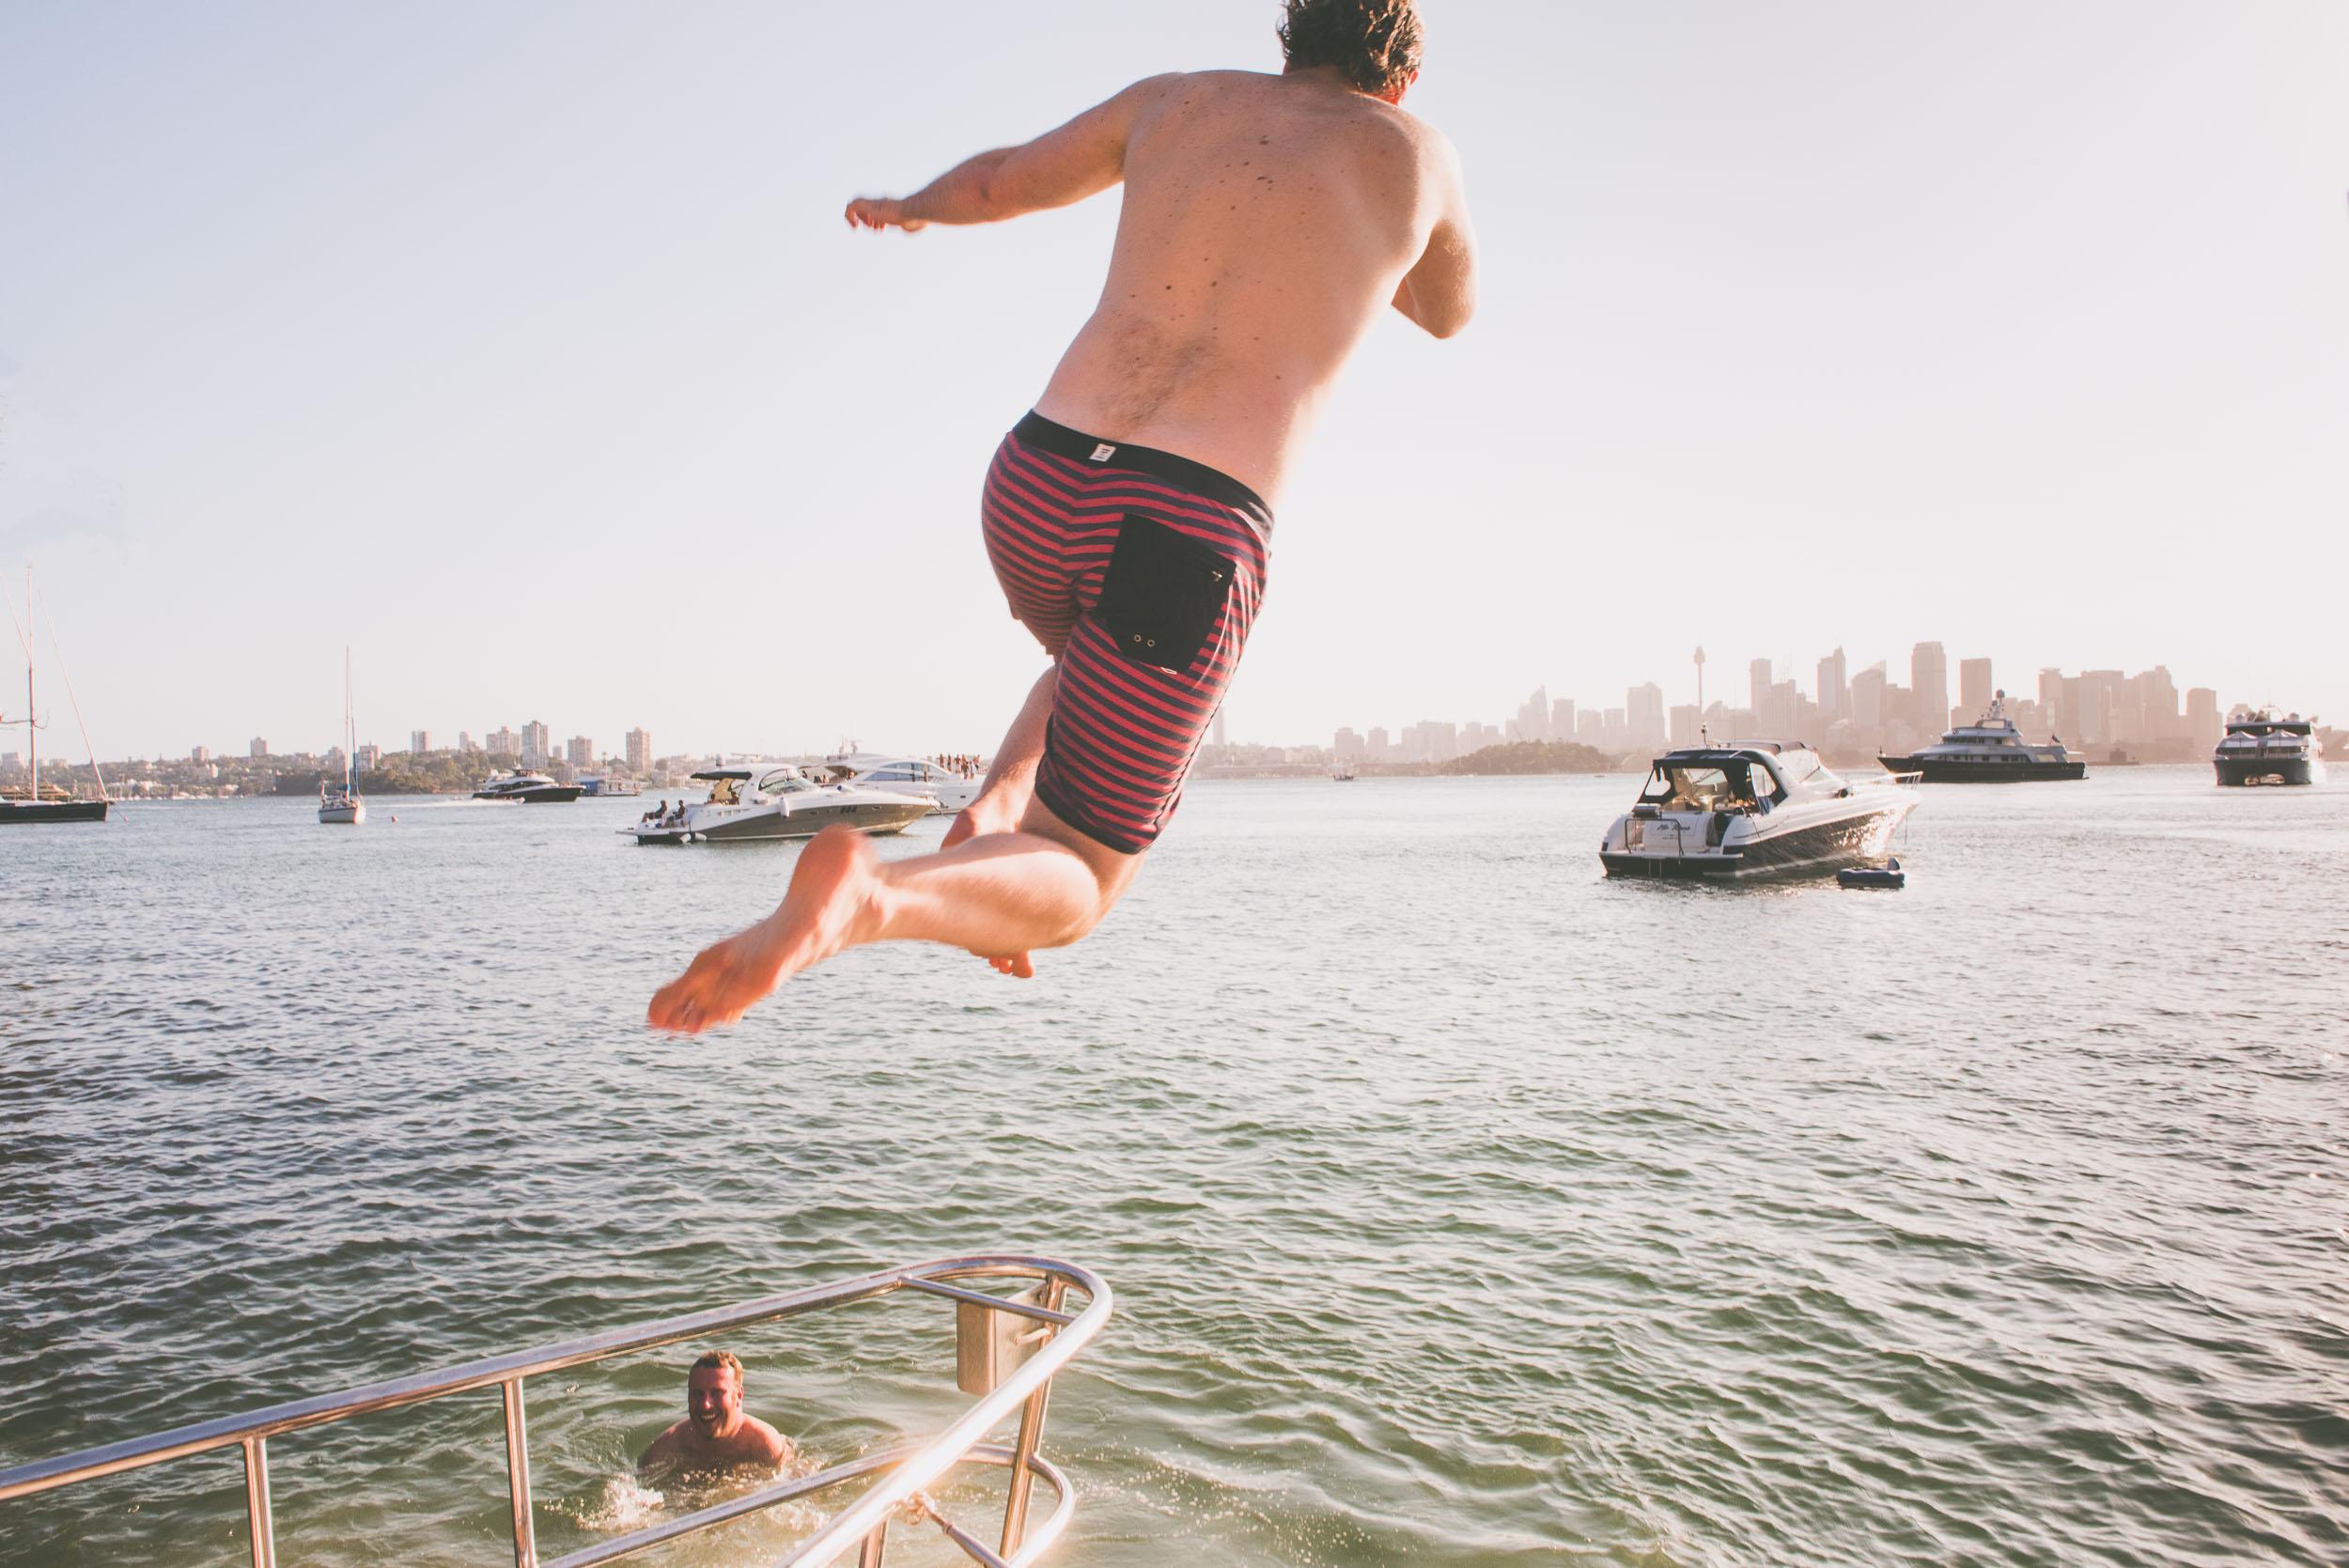 Summer fun - Lifestyle - Photo credit Nicola Bailey.jpg